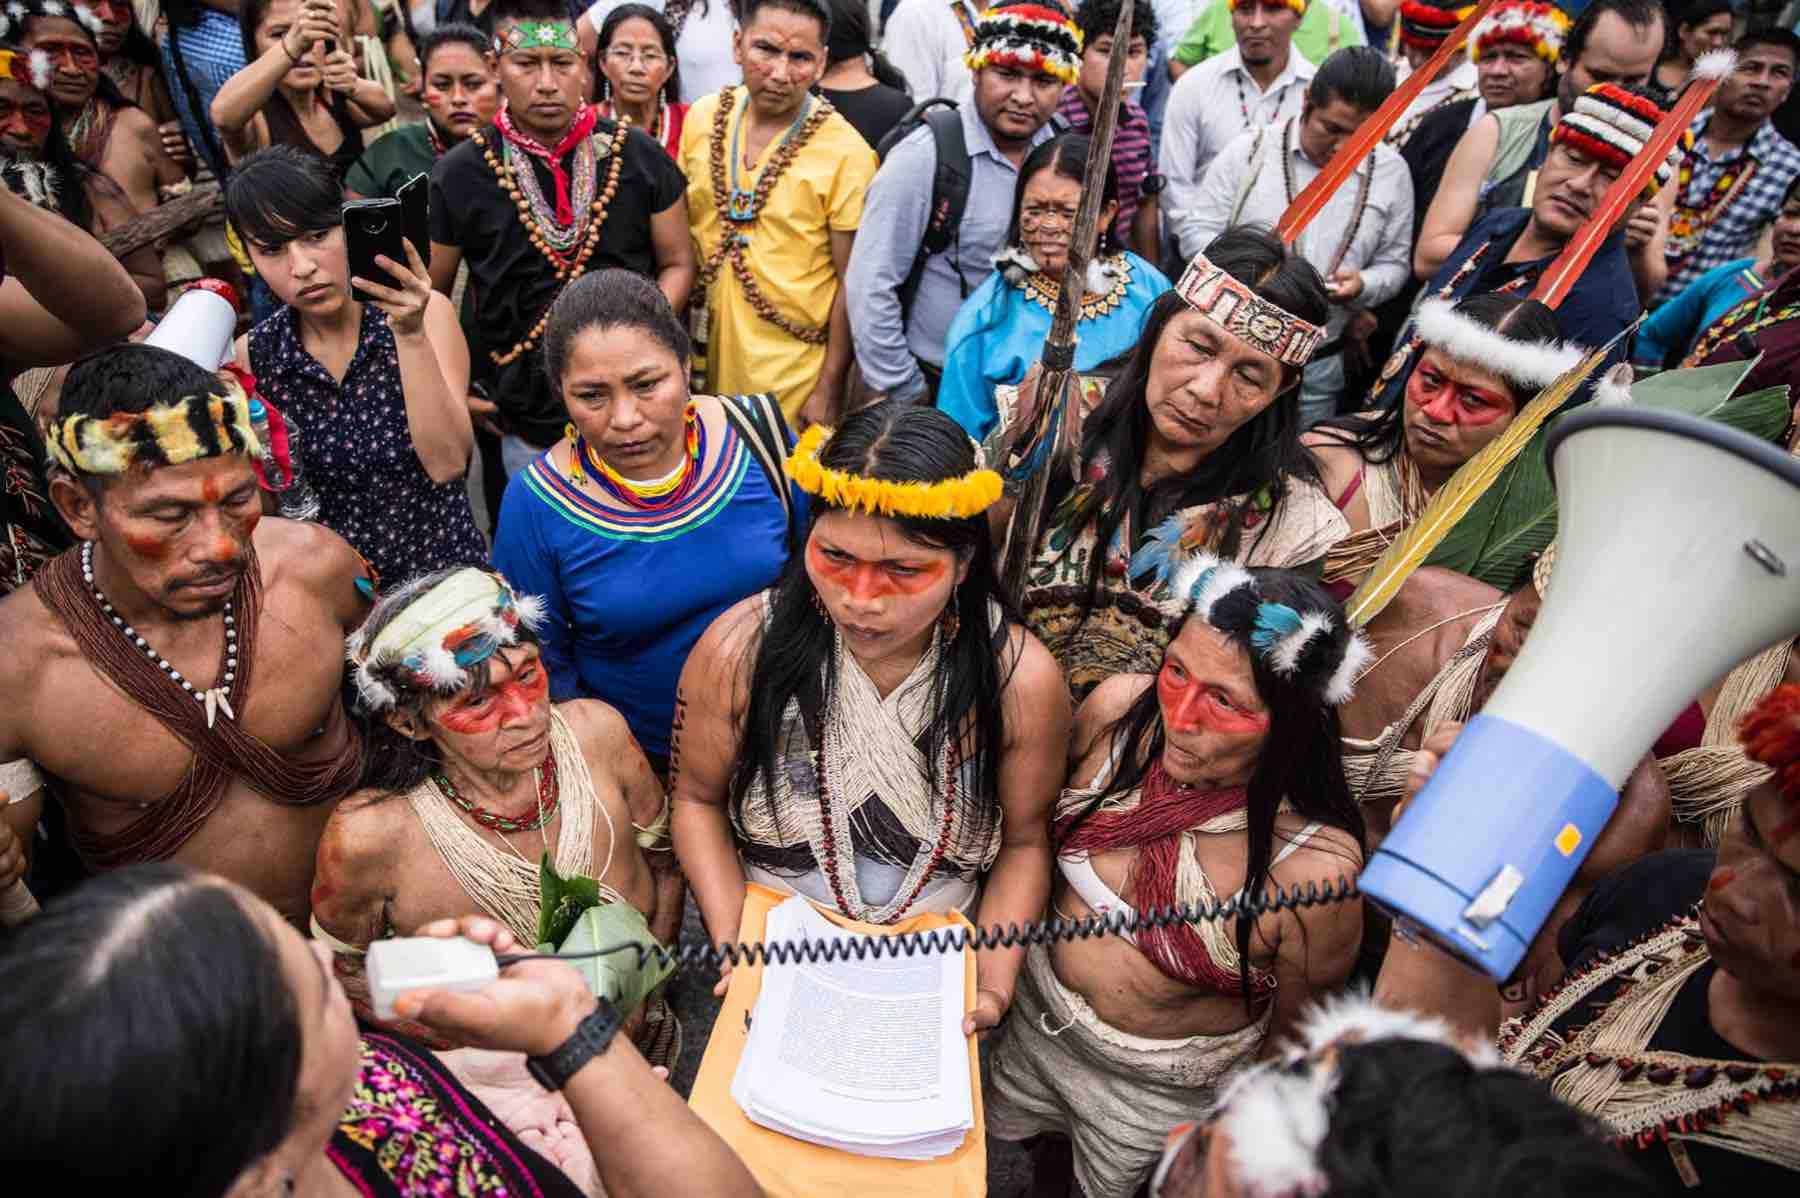 Photo: Mitch Anderson, Amazon Frontlines